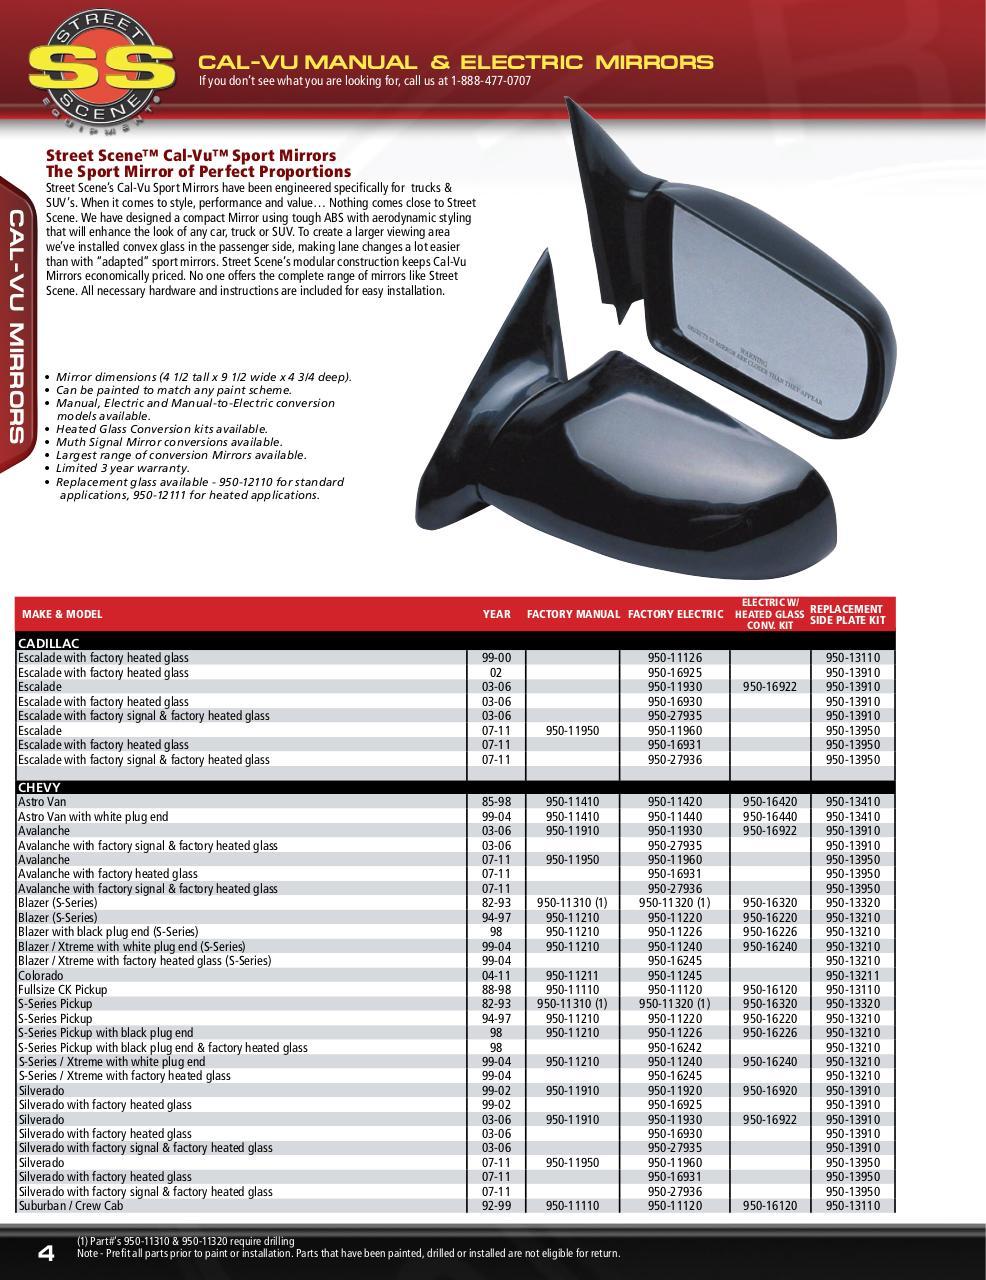 Street Scene 950-14527 Style 13 Street Smart Electric Mirror Kit